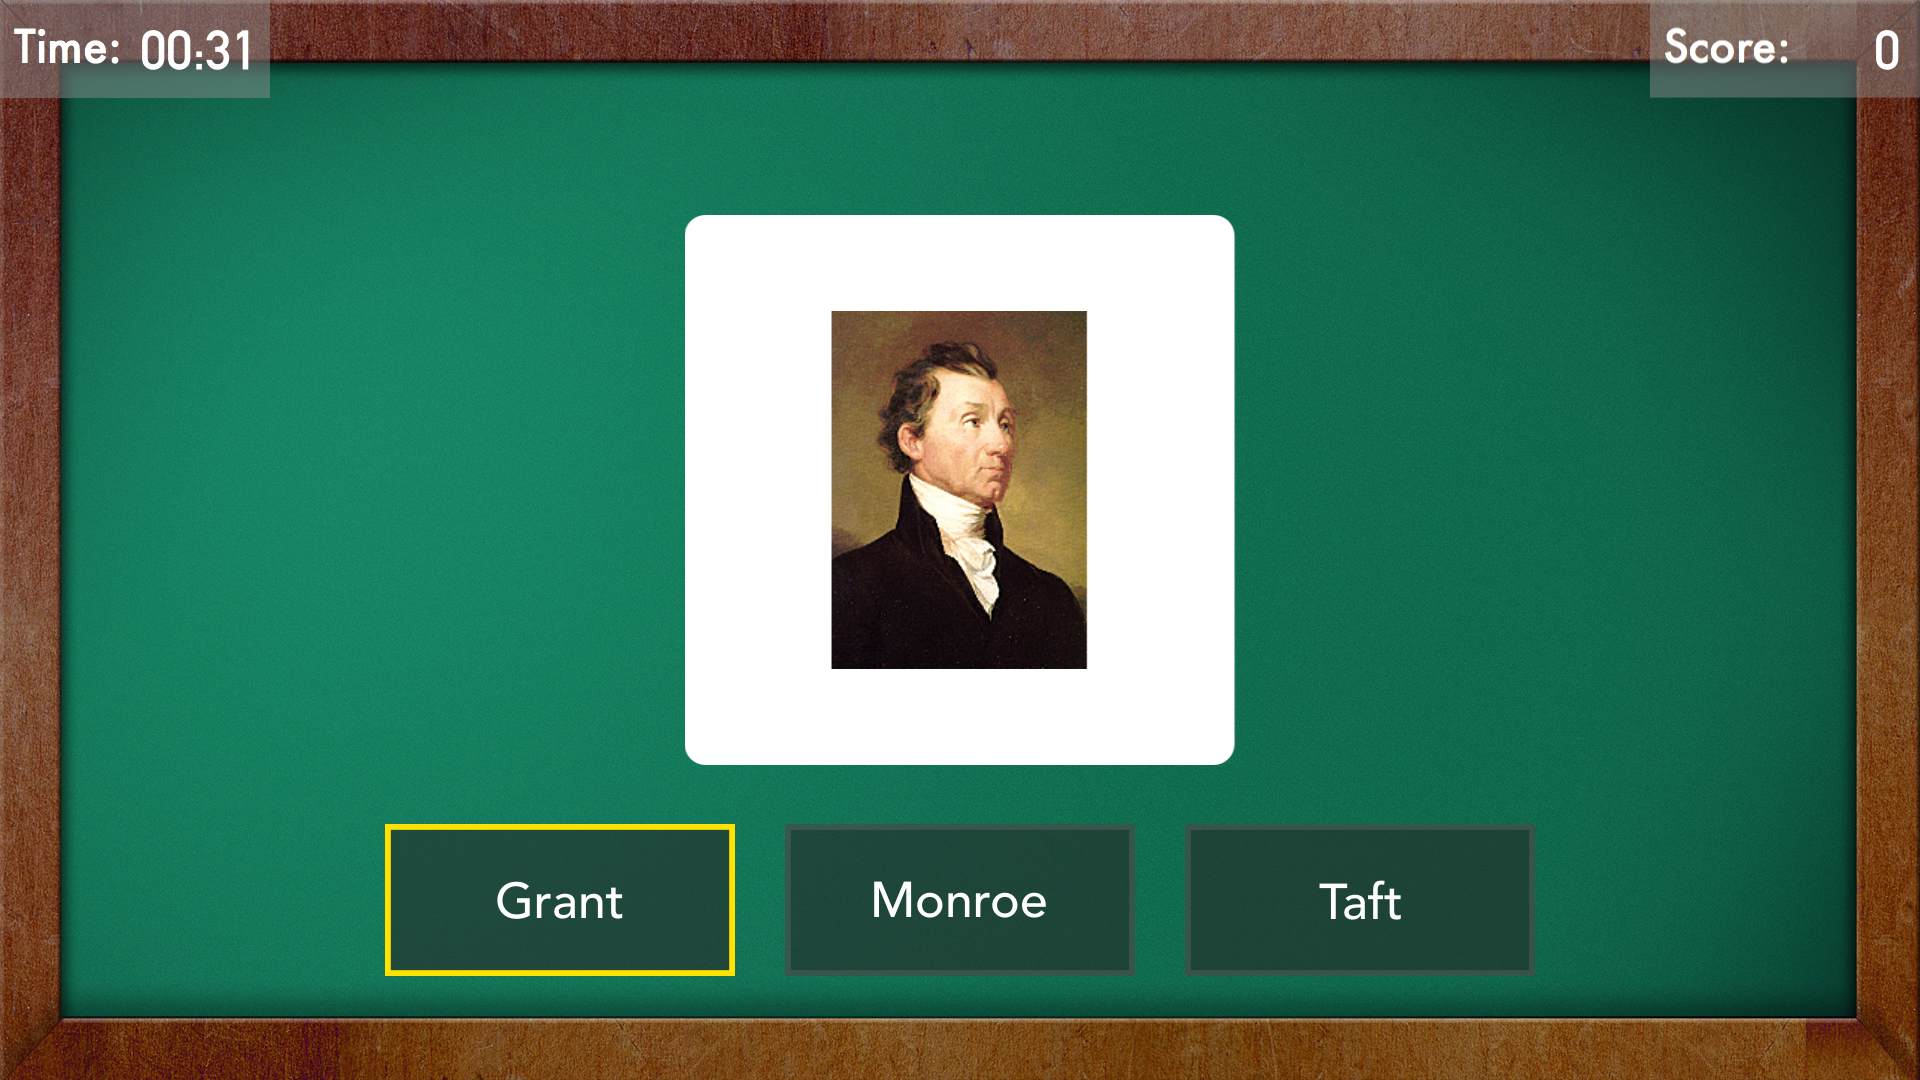 NAME THAT PRESIDENT: Presidential Portrait & Photo Quiz Flash Card Game screenshot 7